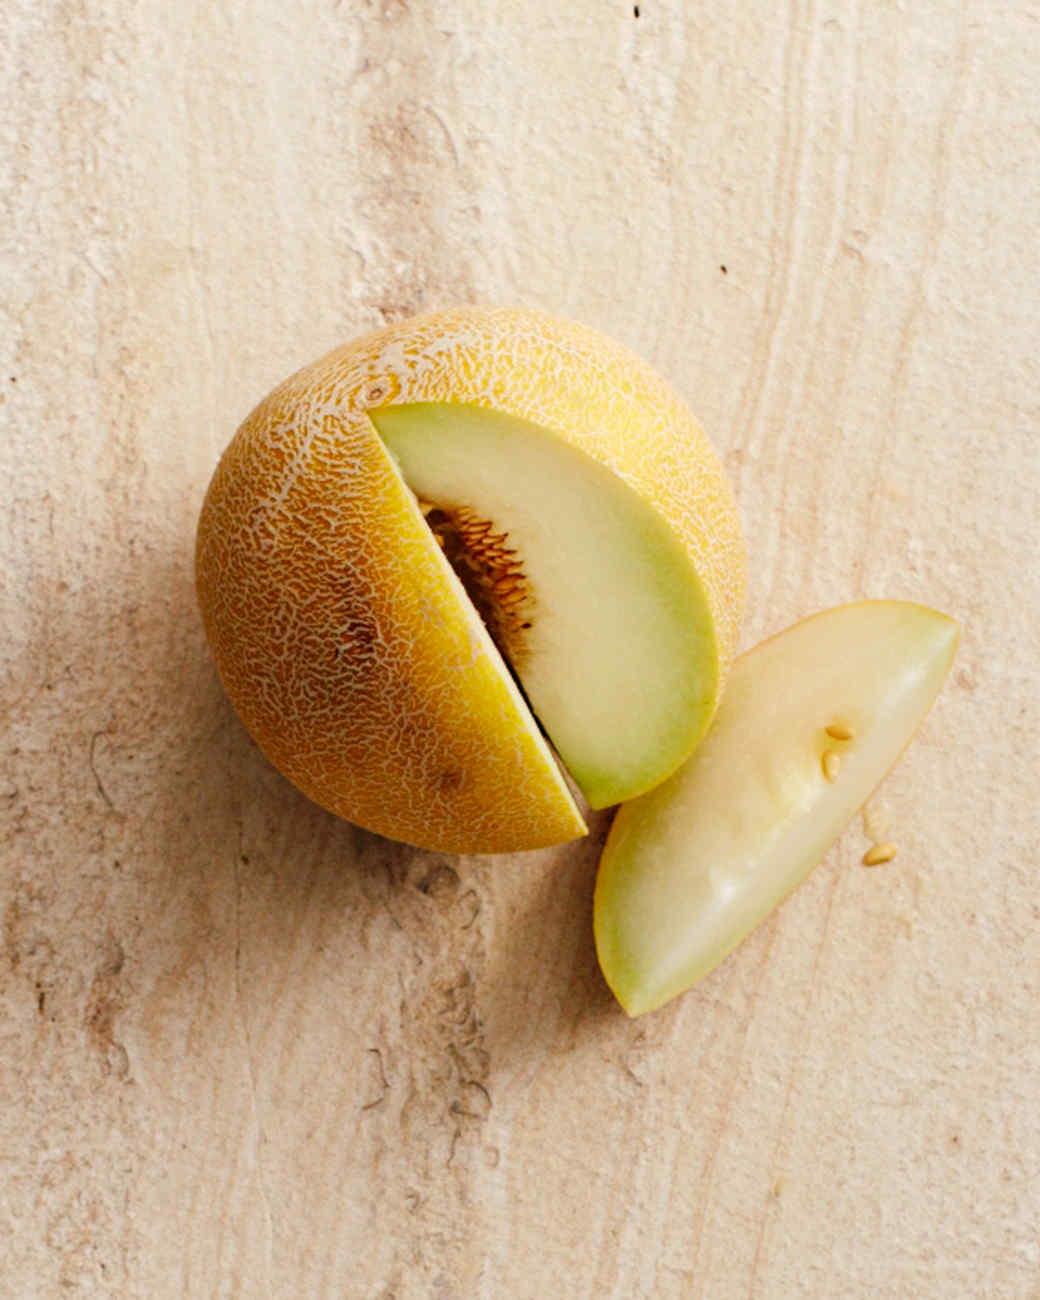 melon-ipad-galia-0188-ld110630-0614.jpg